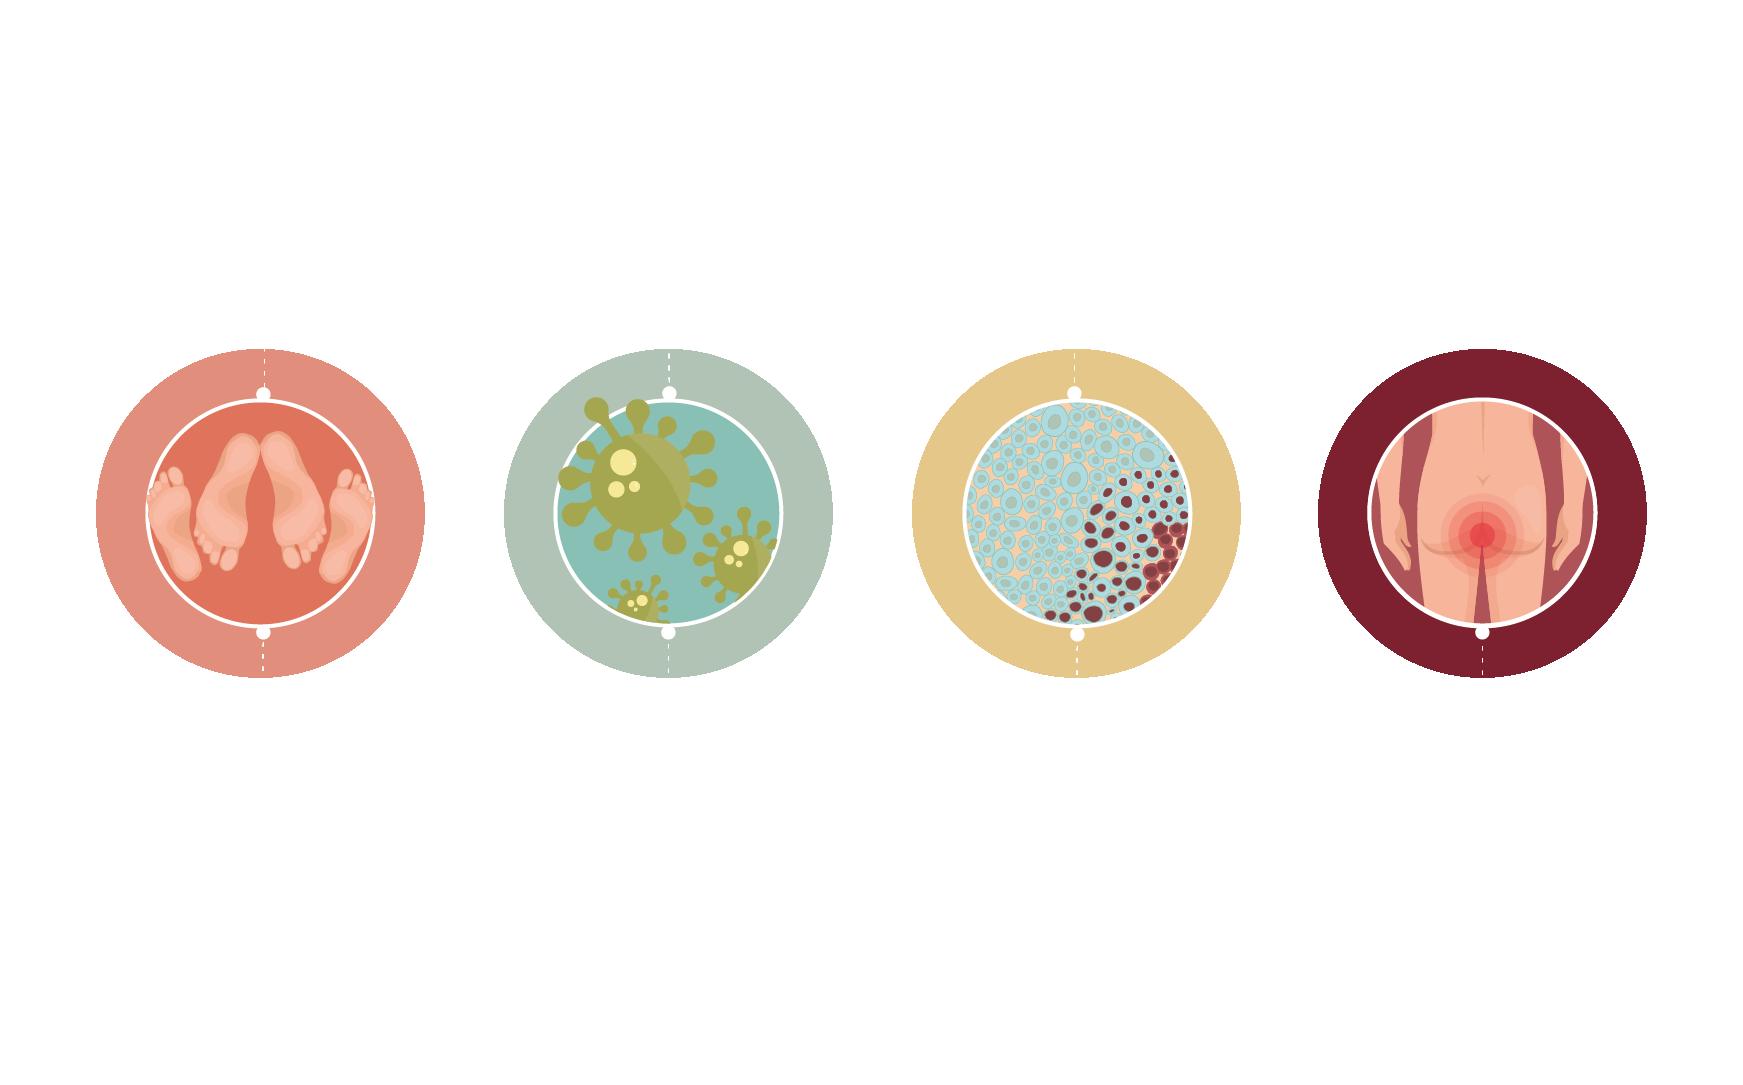 hpv vakcina és eller nej)